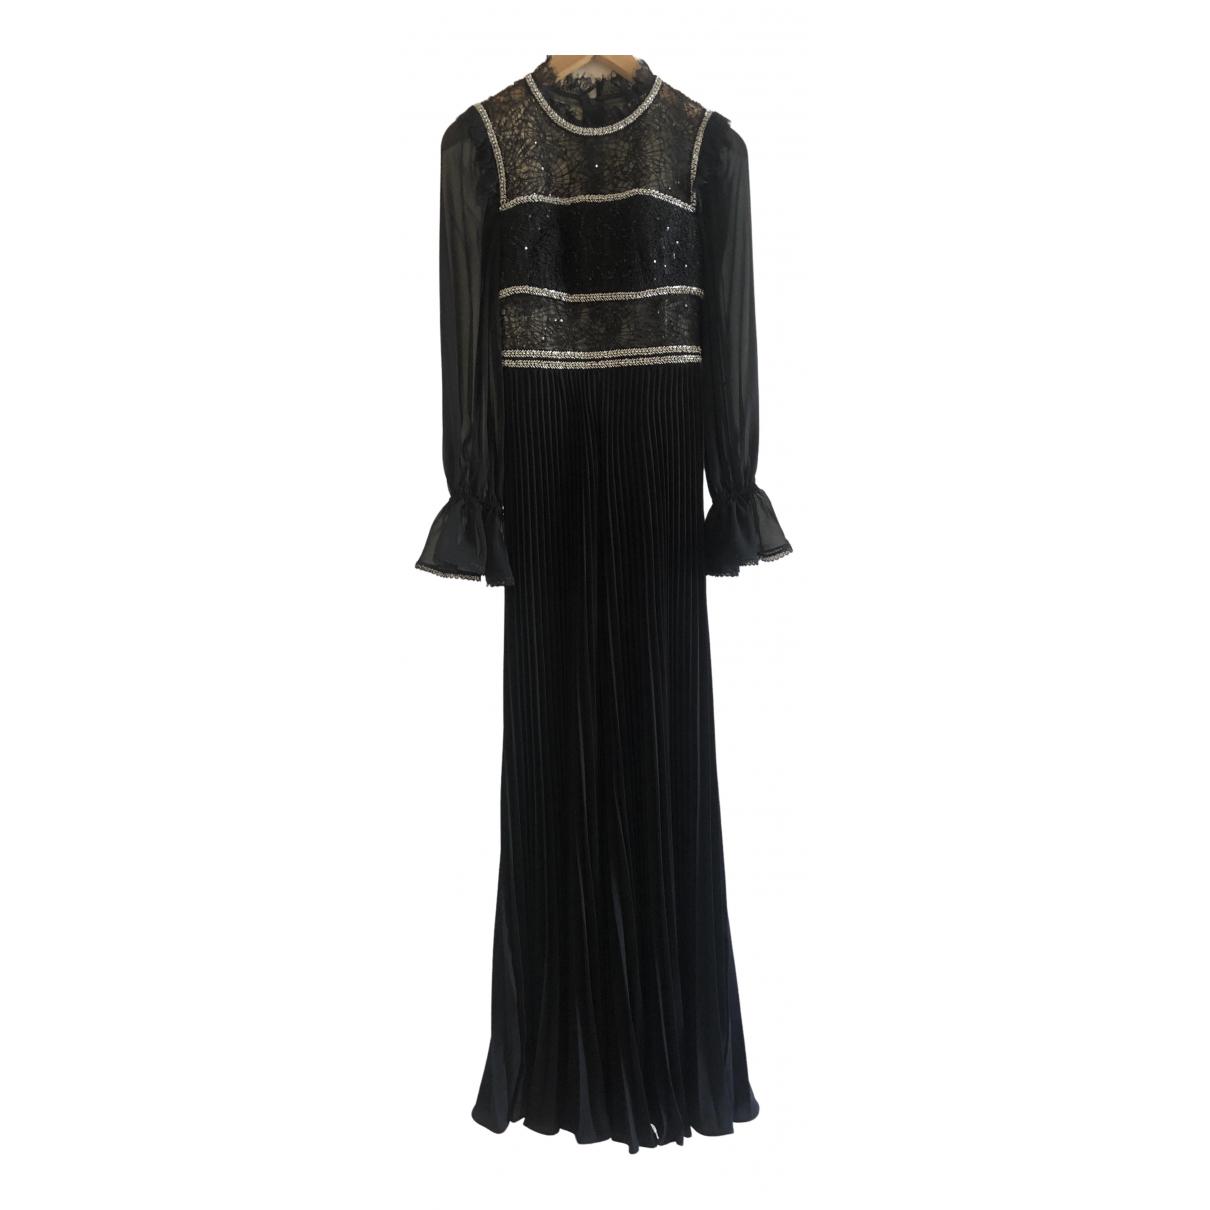 Self Portrait \N Black dress for Women 4 UK